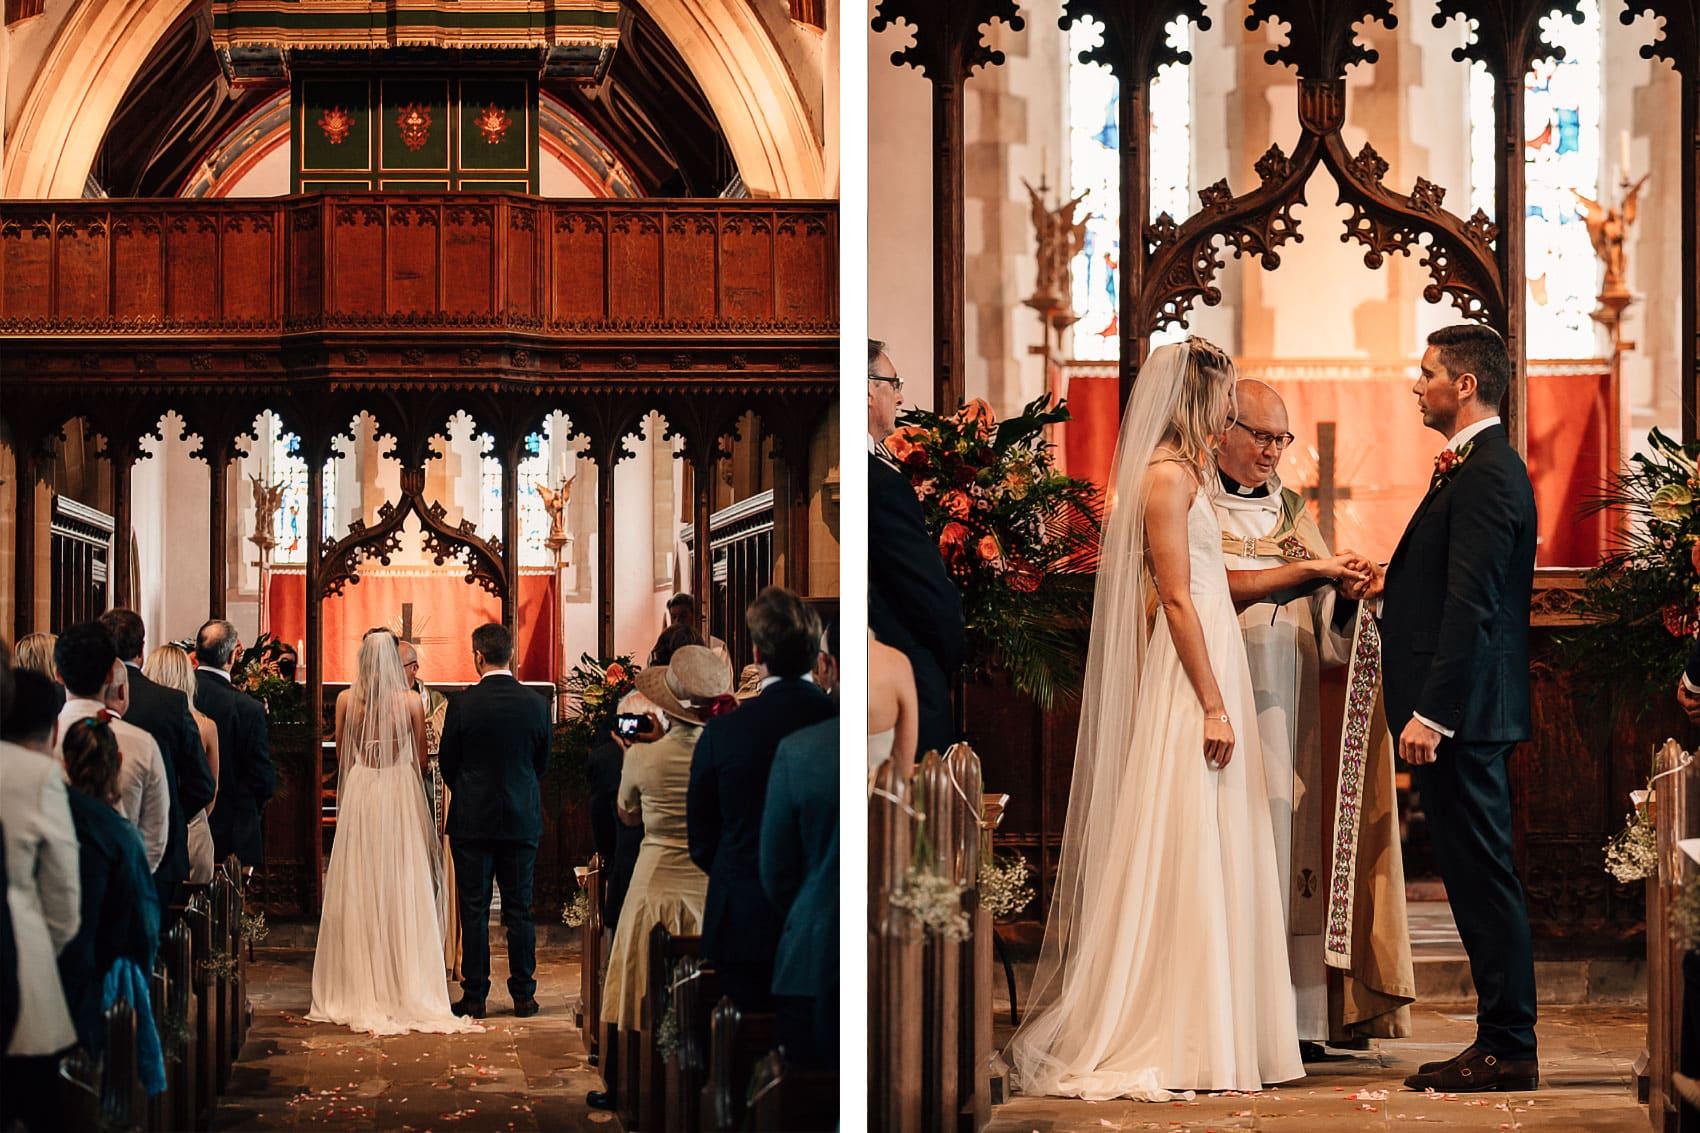 church ceremony documentary wedding photography